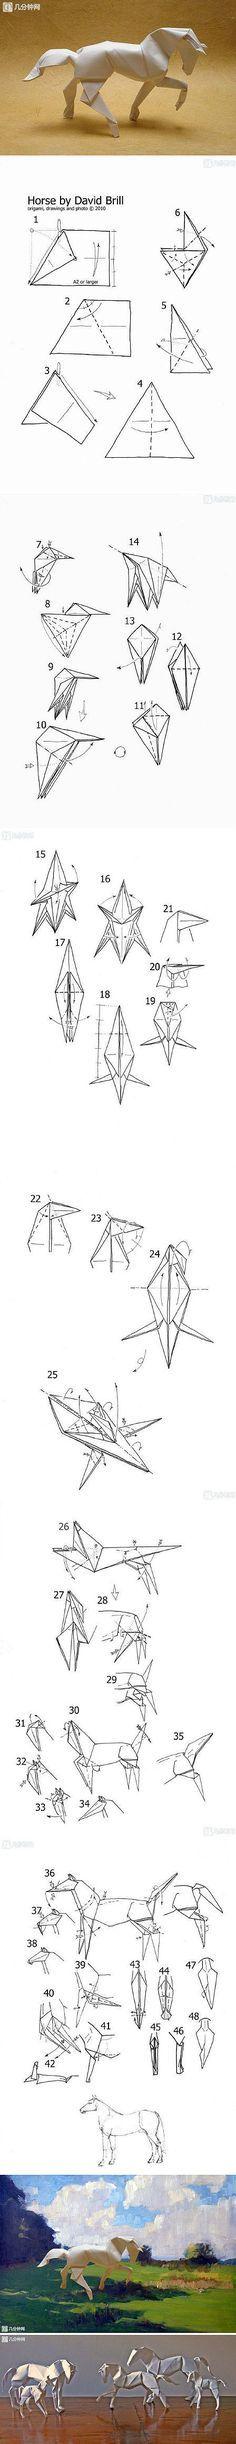 Origami Horse. More origami @ http://www.origamiinstruction.com/